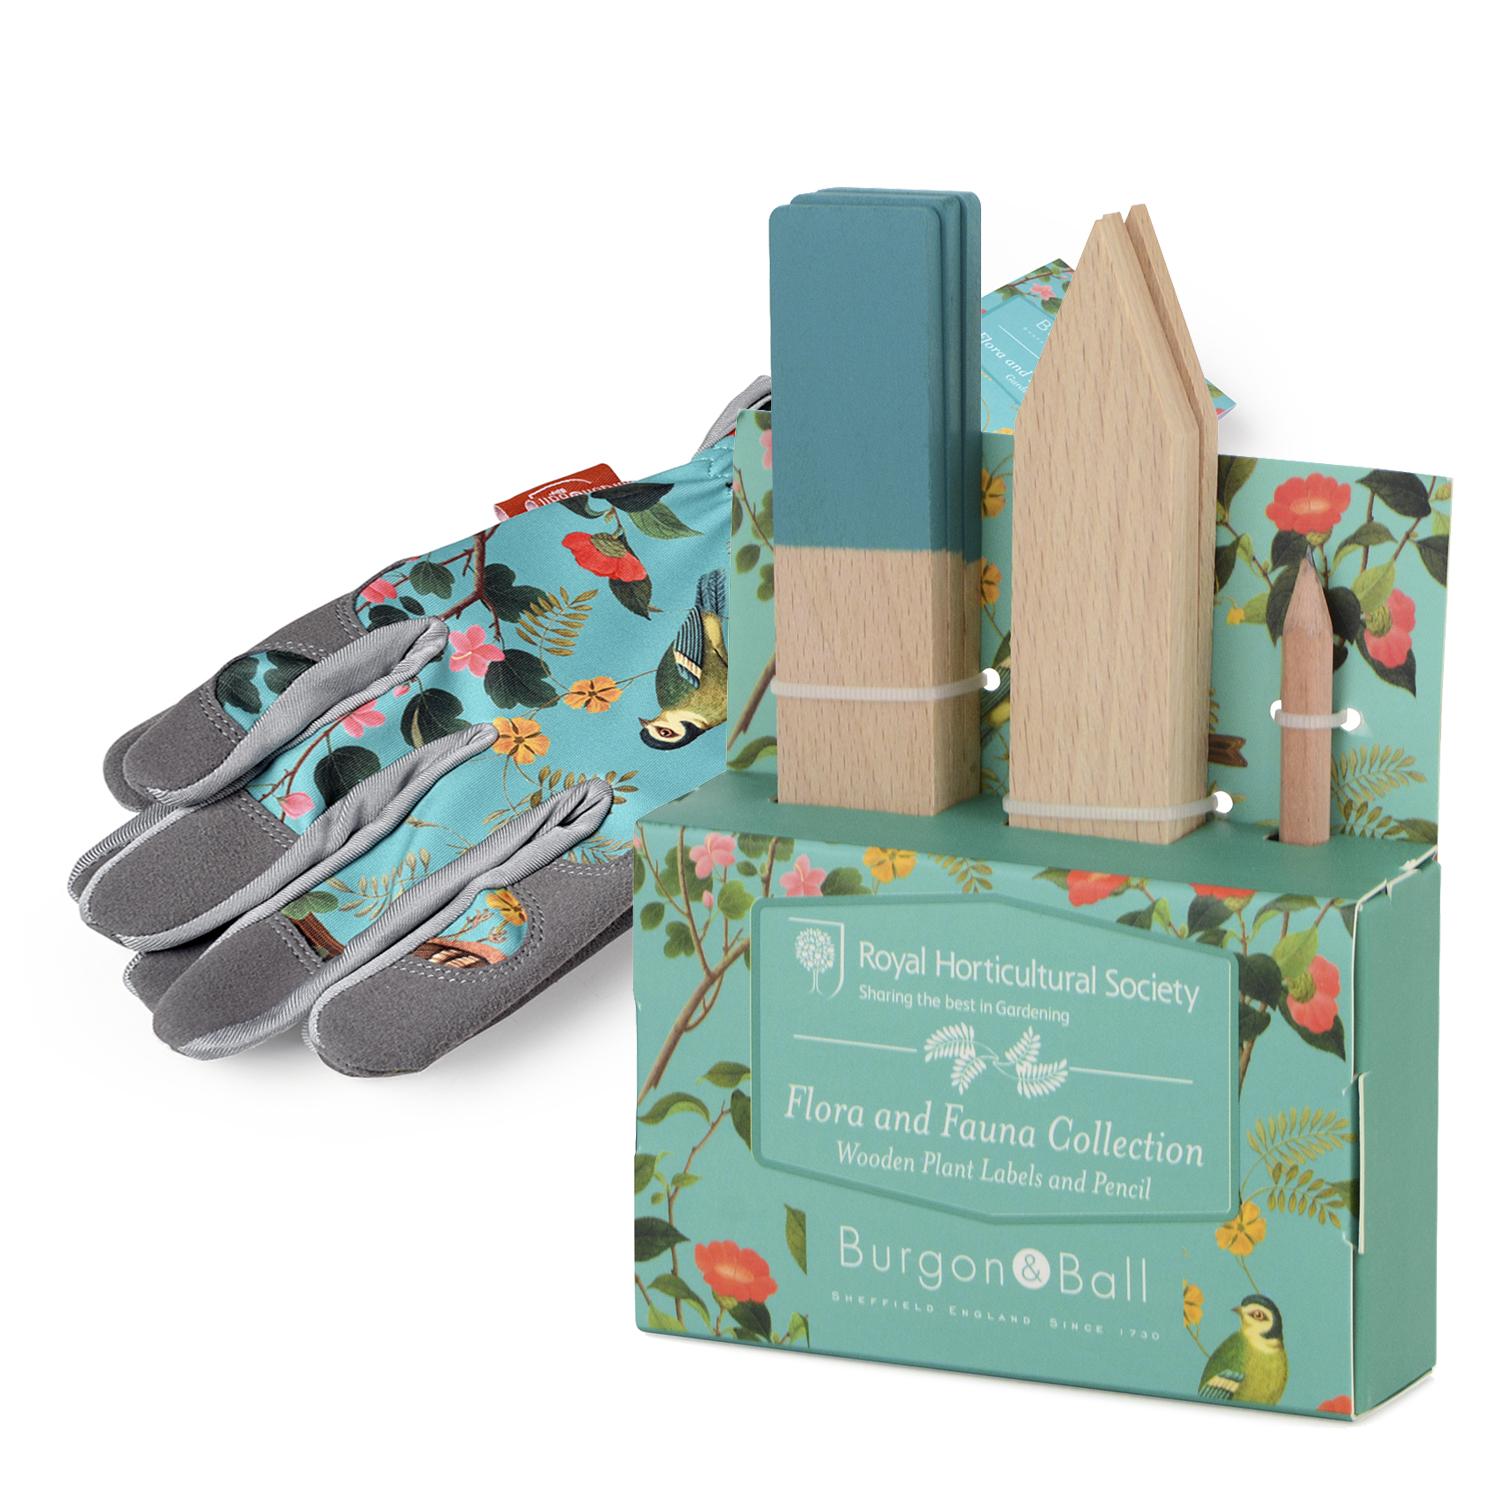 Burgon & Ball – RHS Flora & Fauna Gloves & RHS Flora & Fauna Wooden Plant Labels